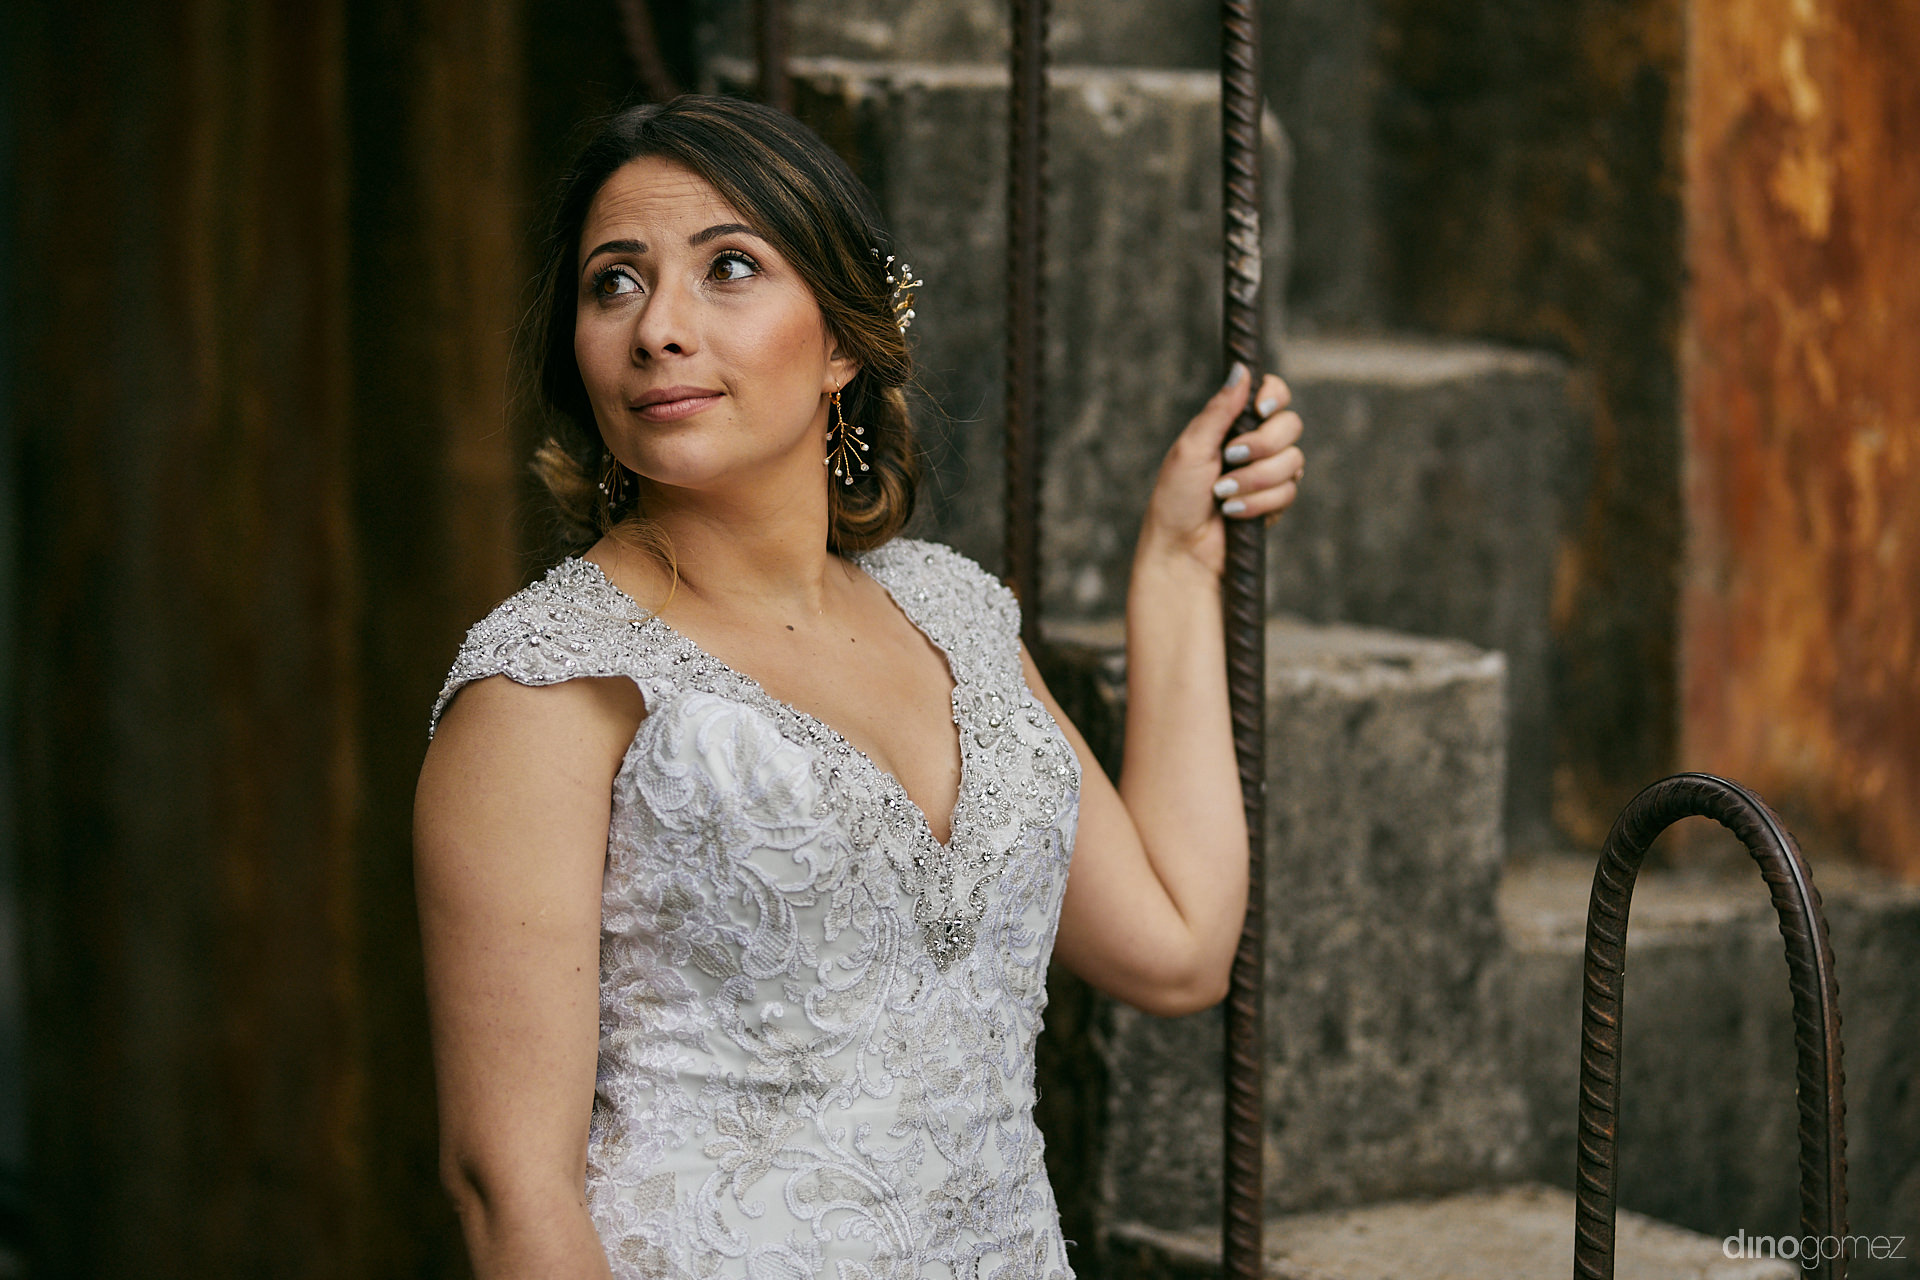 025 - Diy Budget Destination Weddings Can Be Prety Too!